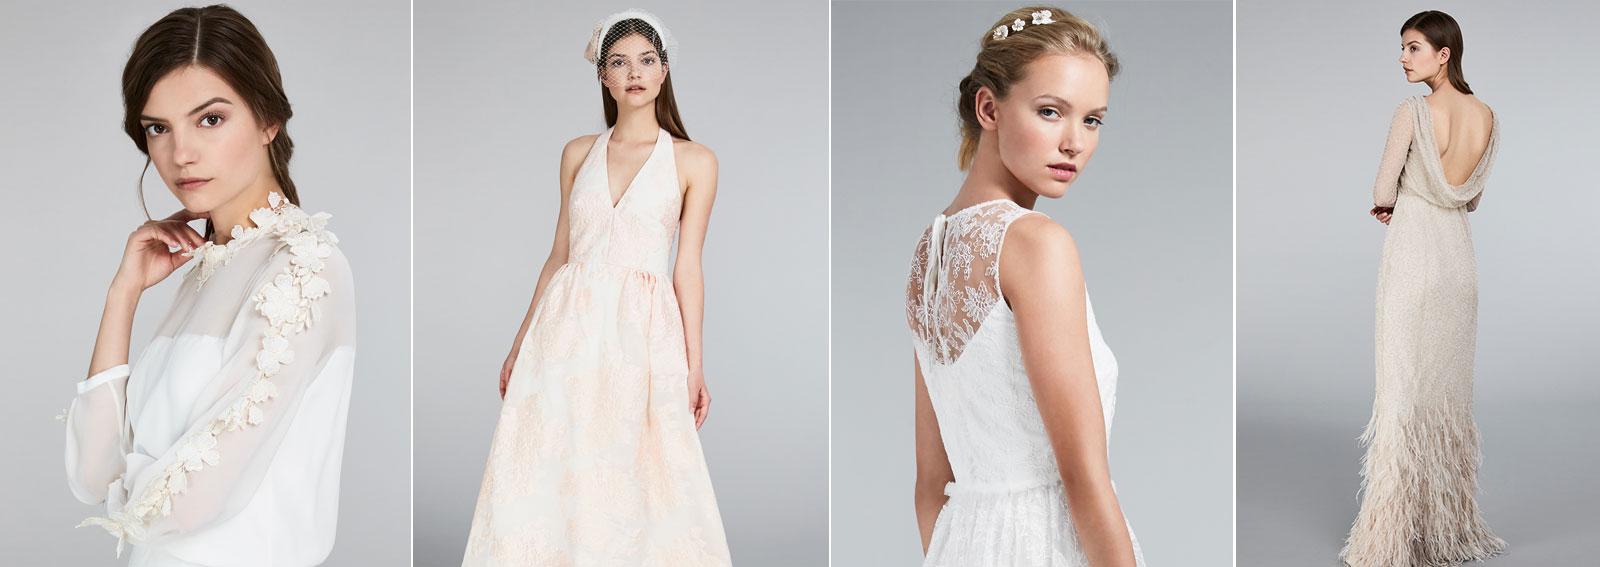 Max mara wedding dresses 2018 pictures